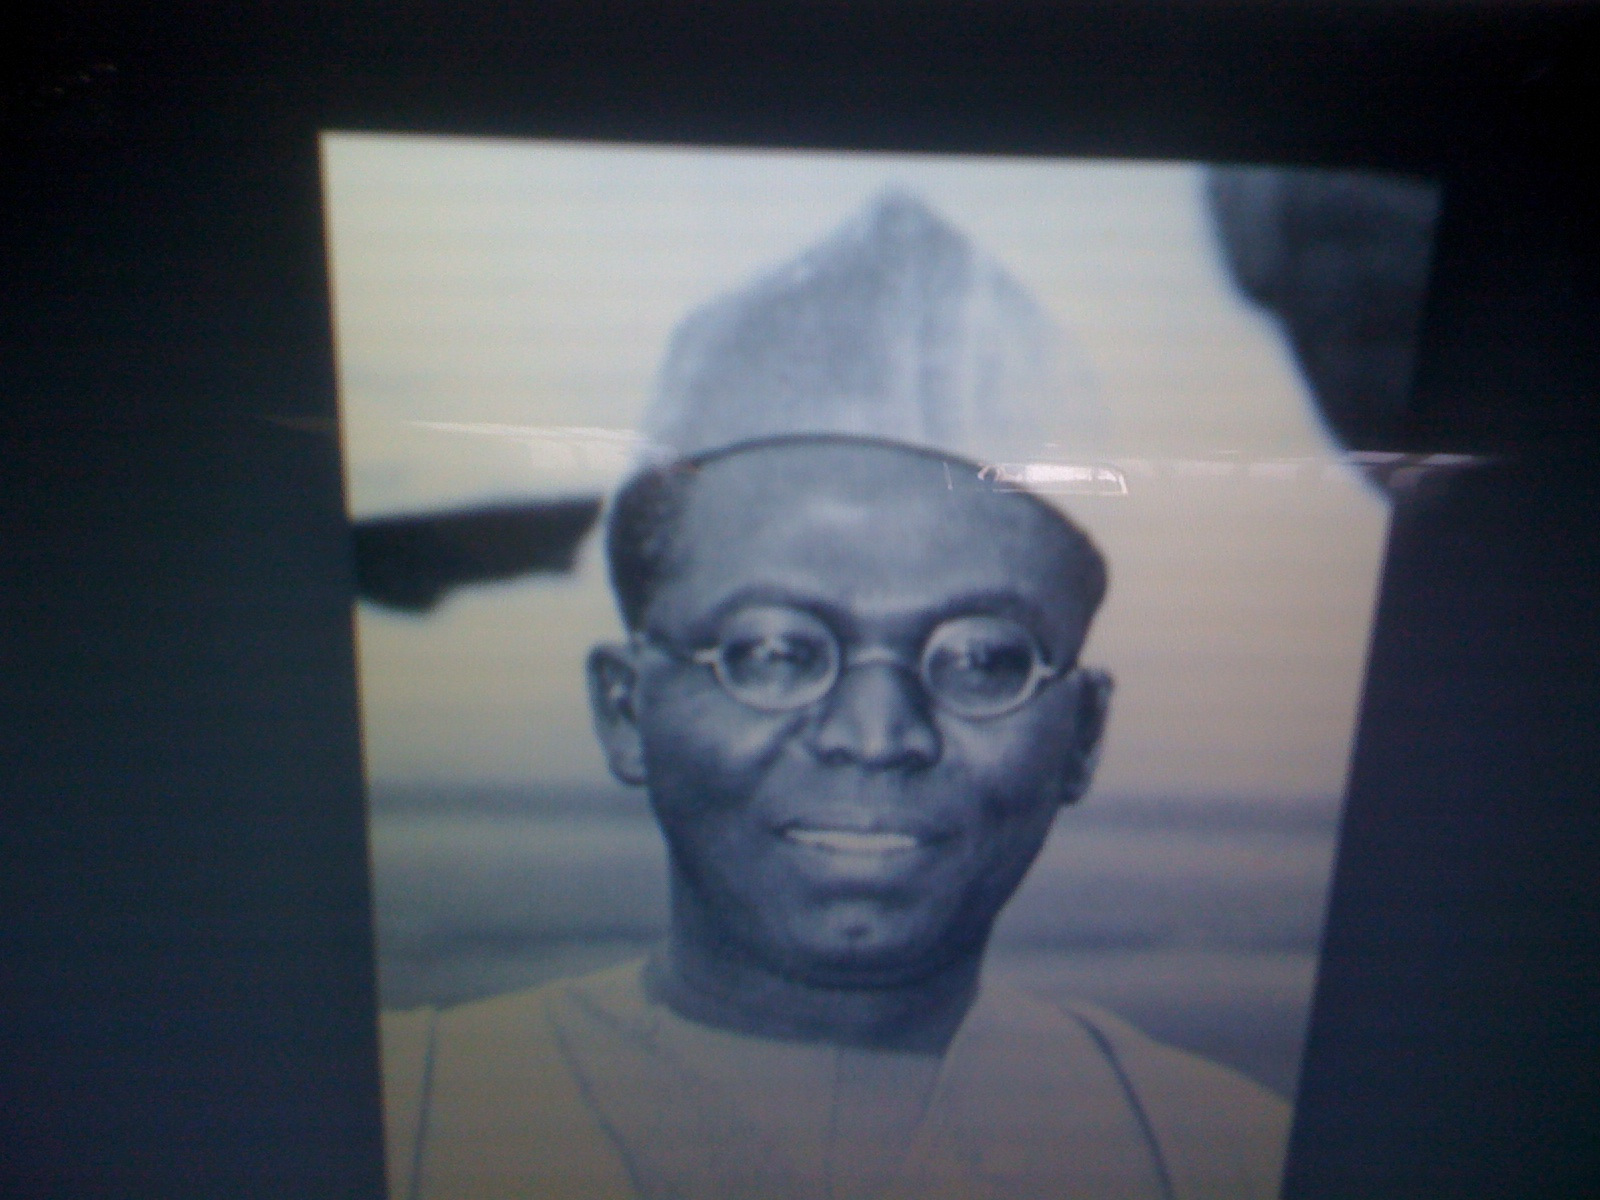 contribution of nnamdi azikiwe to the development of nigeria The indispensable role of taxation for state development in nigeria  maria chinecherem uzonwanne department of economics, nnamdi azikiwe university, awka, anambra state, nigeria.